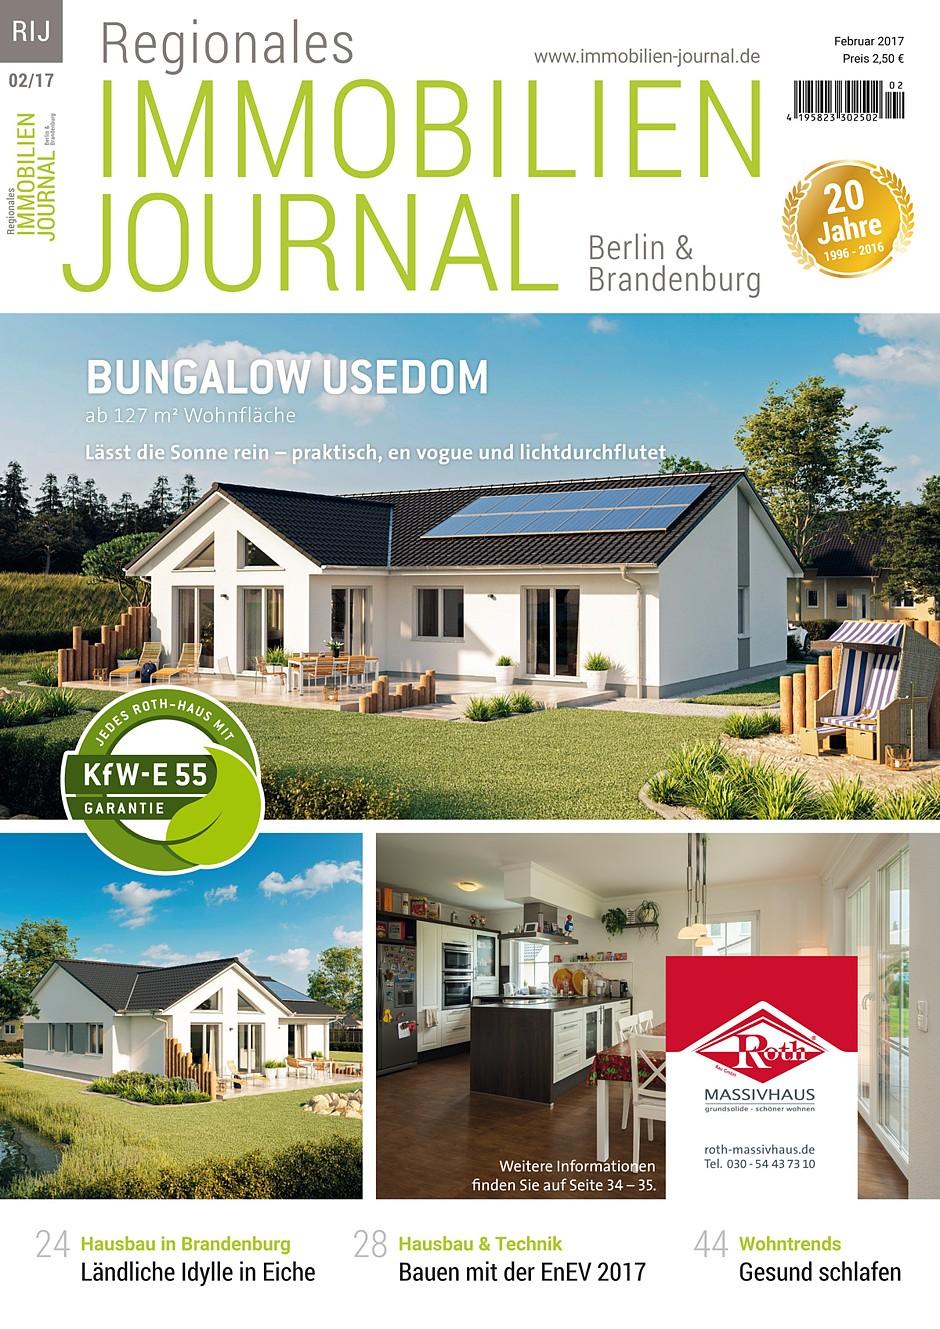 Hausbaufirmen In Brandenburg regionales immobilien journal berlin brandenburg februar 2017